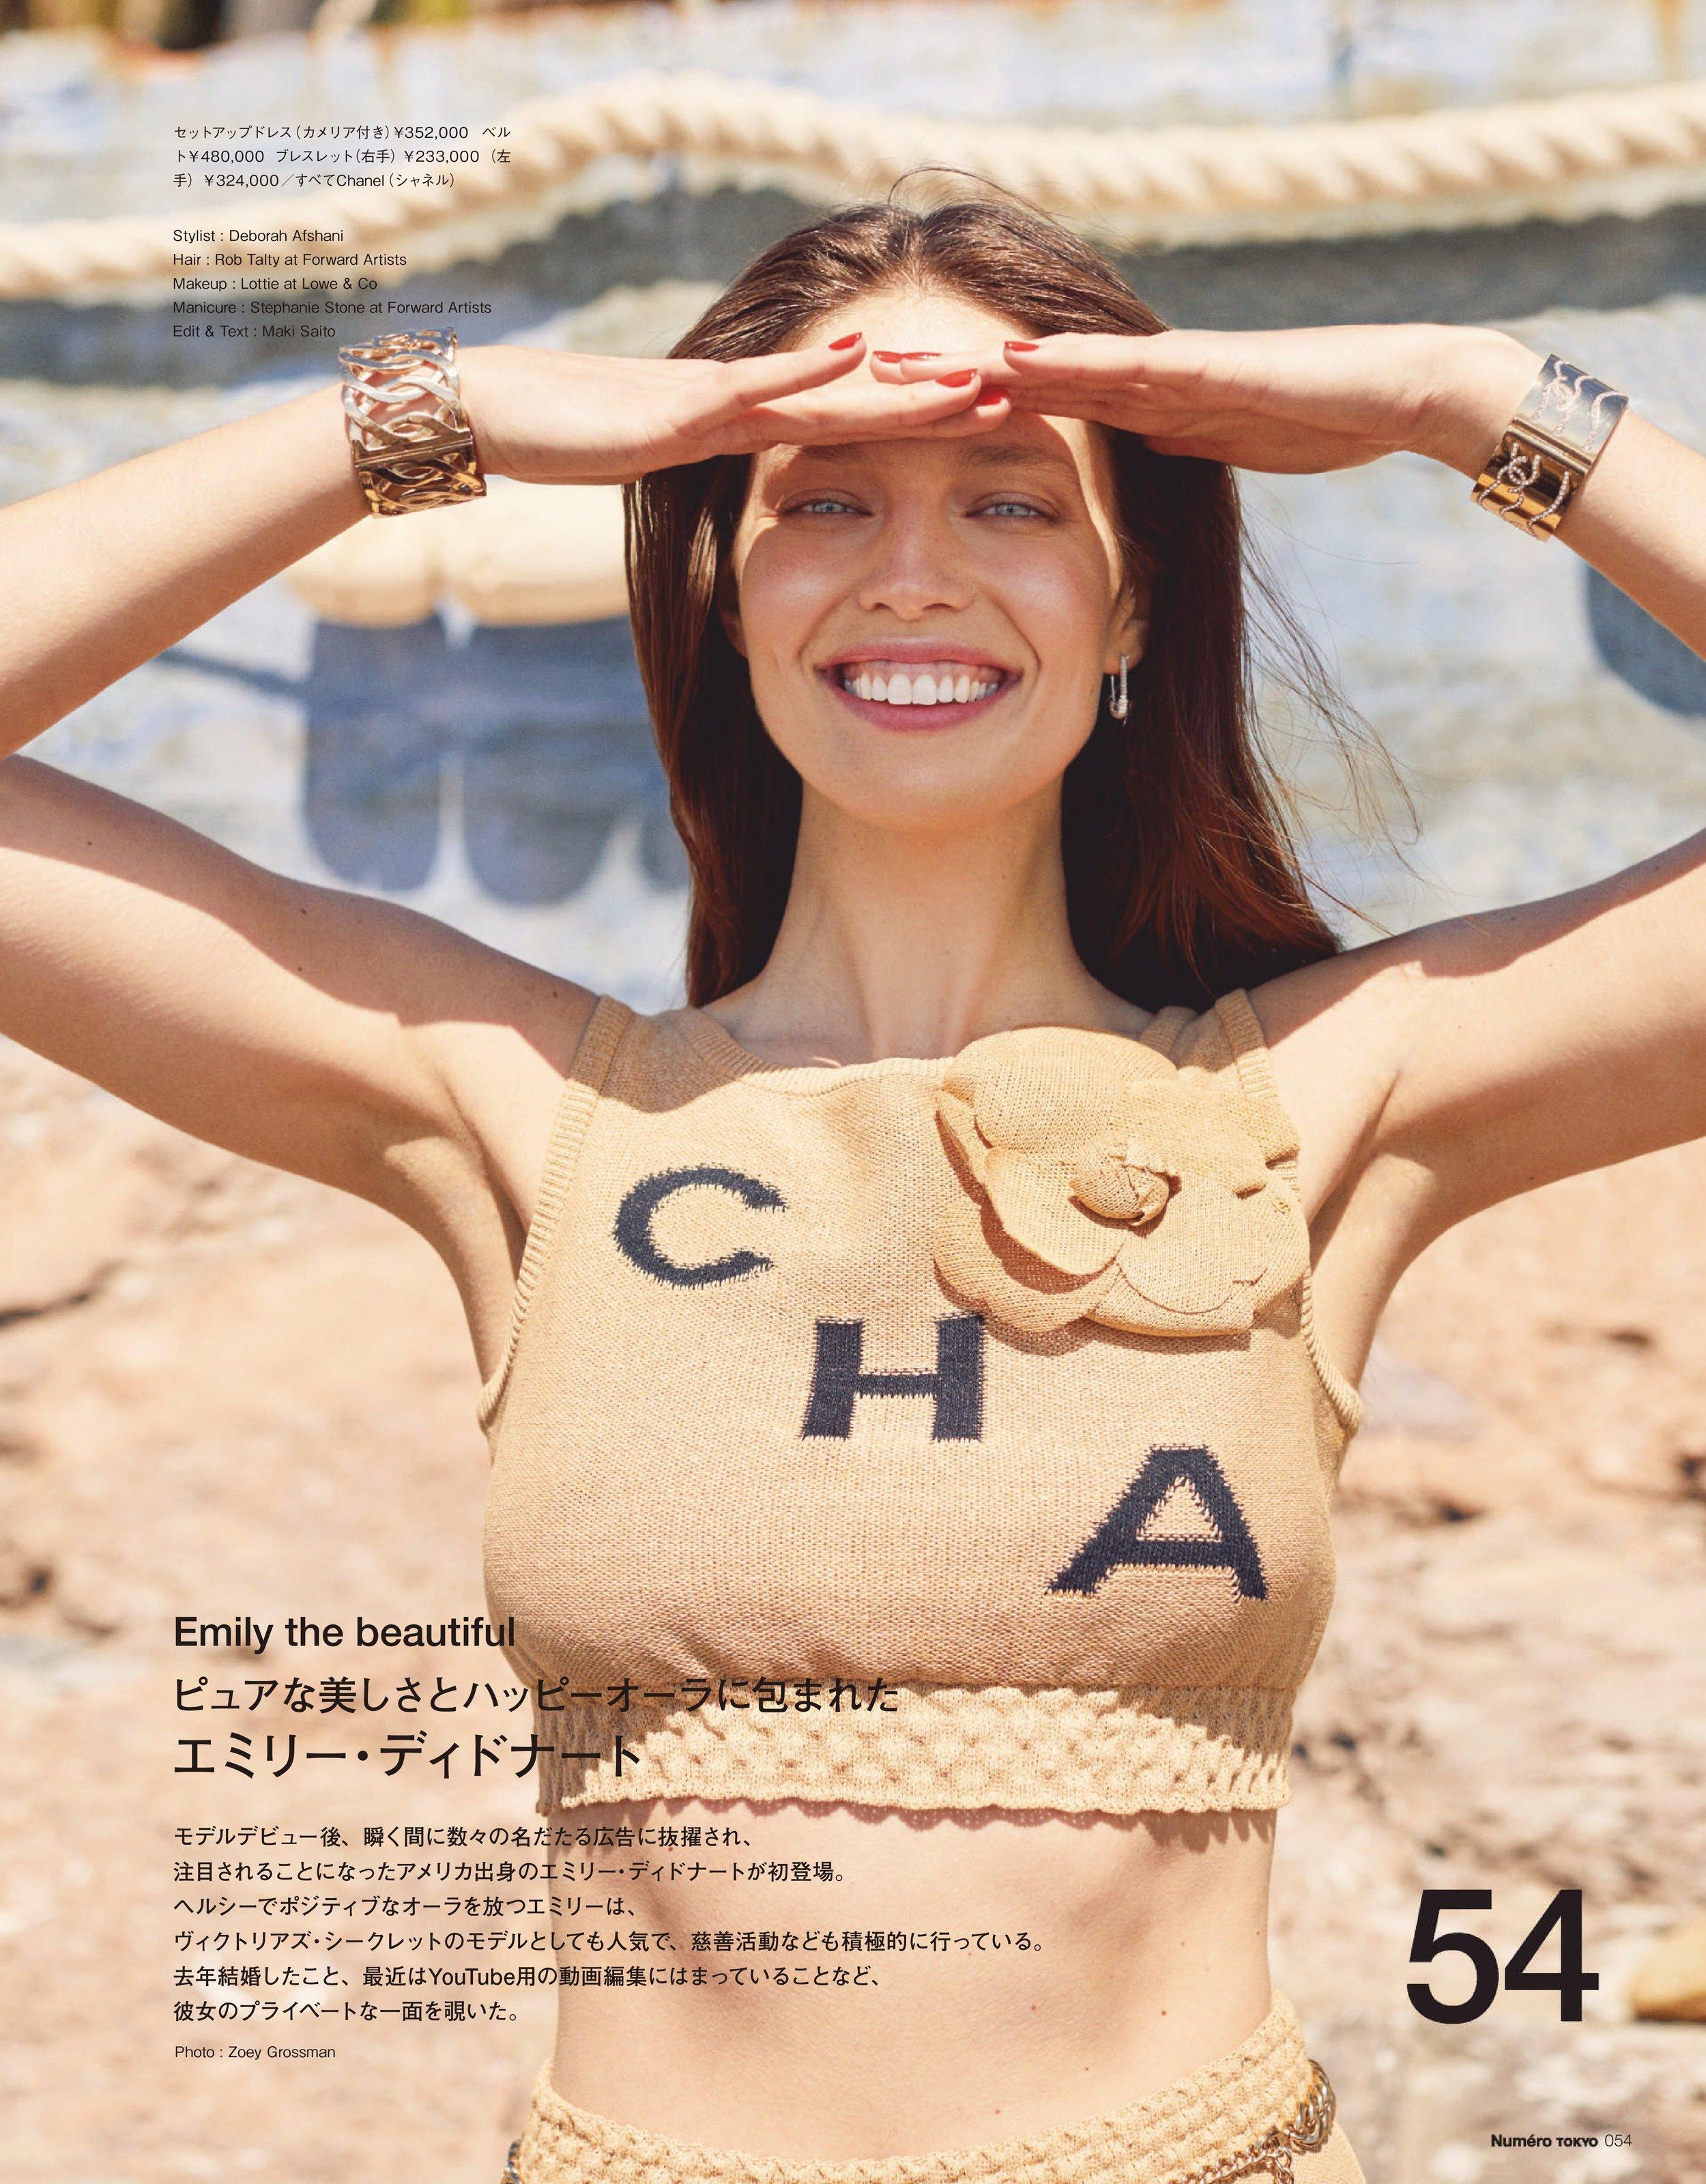 Emily DoDonato by Zoey Grossman for Numero Tokyo June 2019 (6).jpg